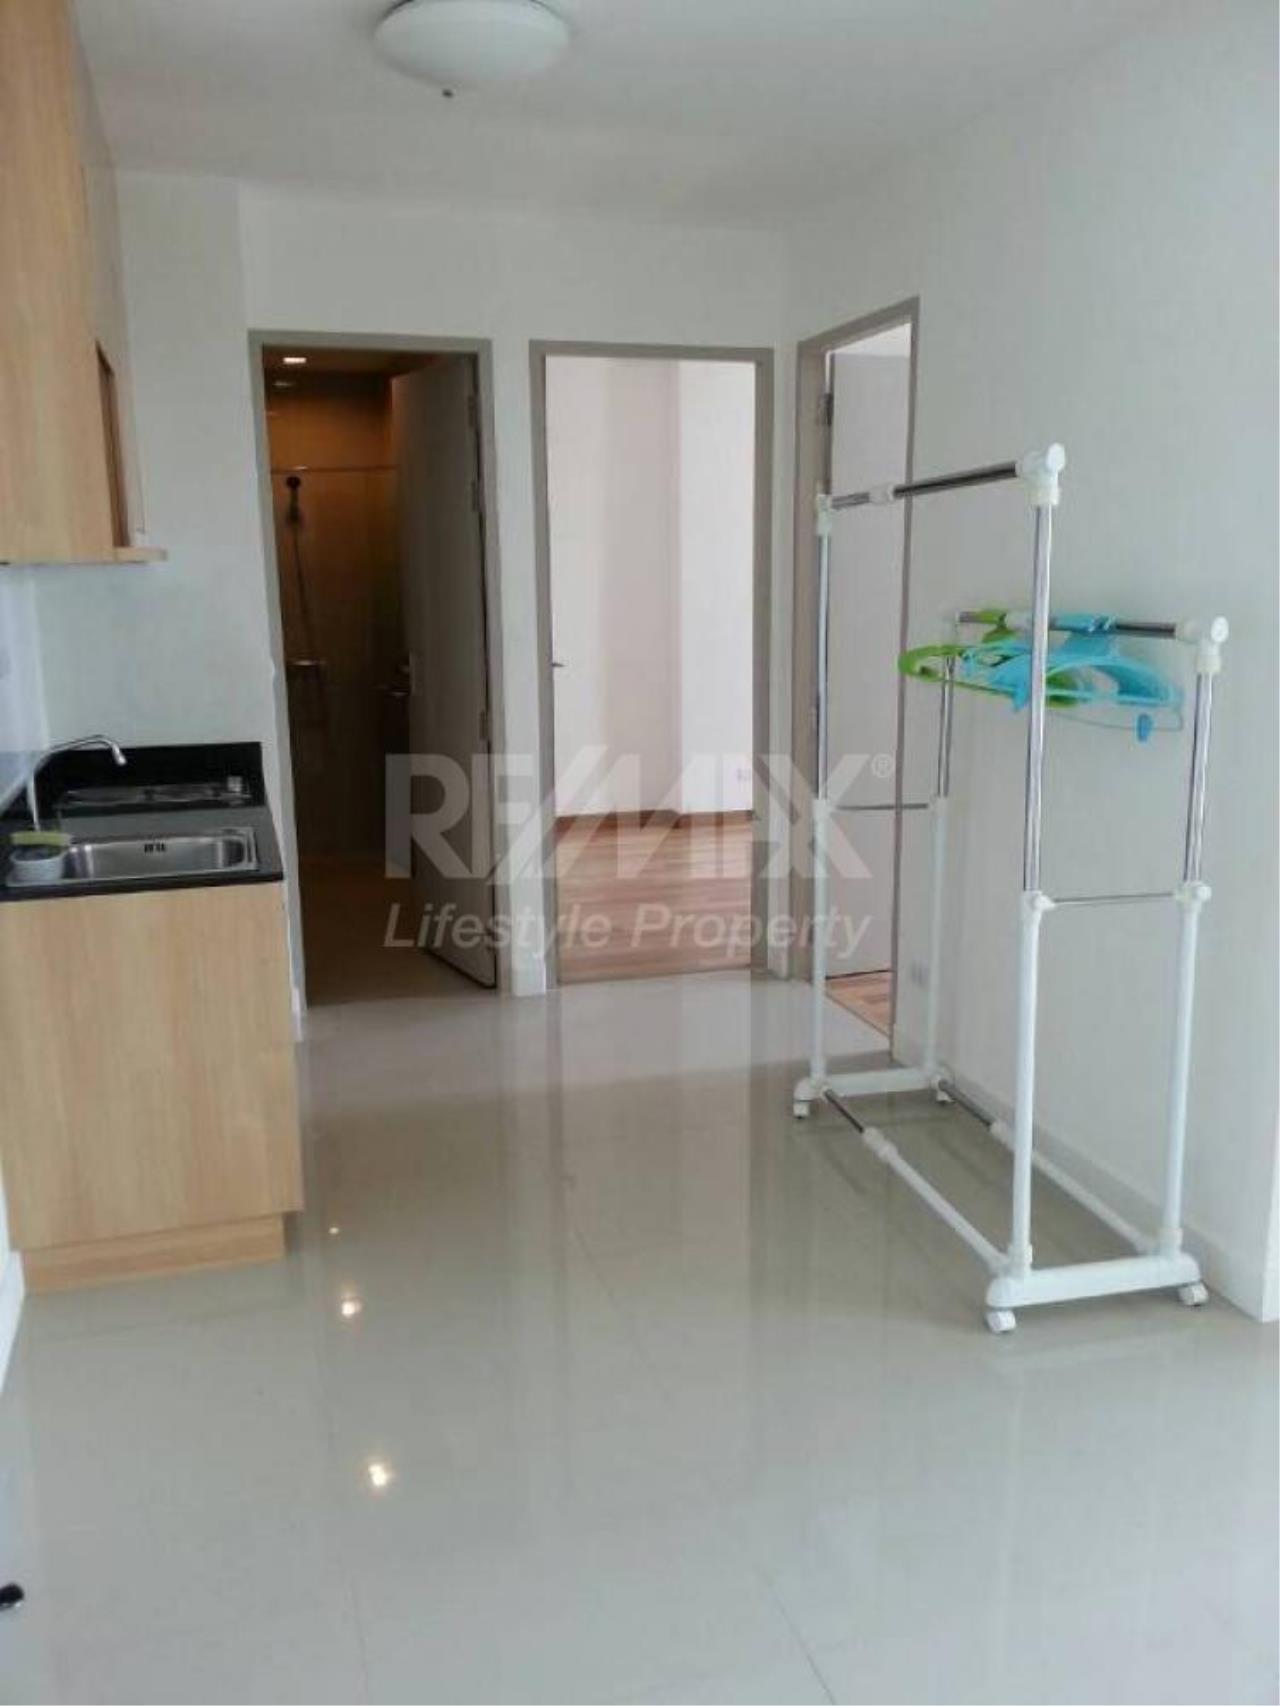 RE/MAX LifeStyle Property Agency's Ideo Blucove Sukhumvit 4